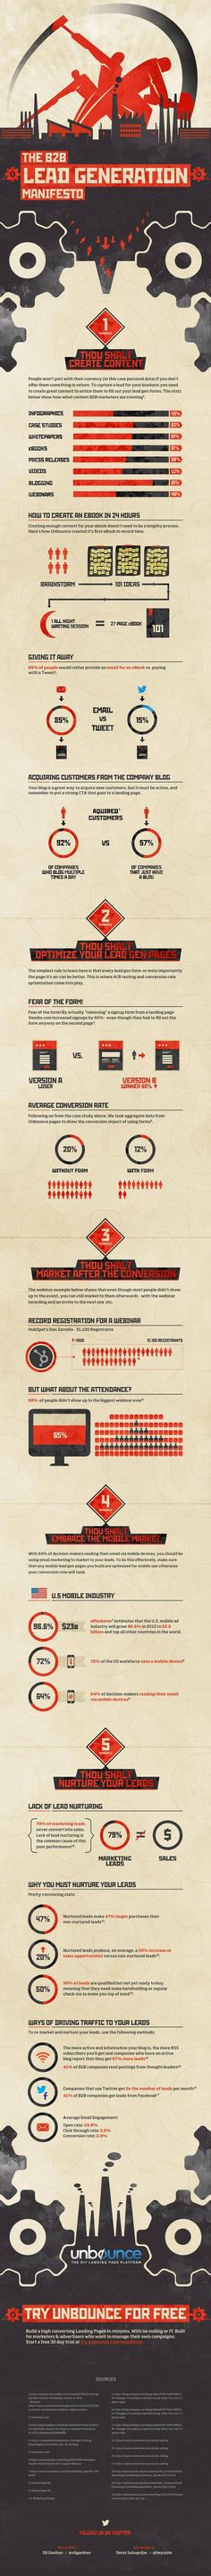 The B2B Lead Generation Manifesto - #infographic